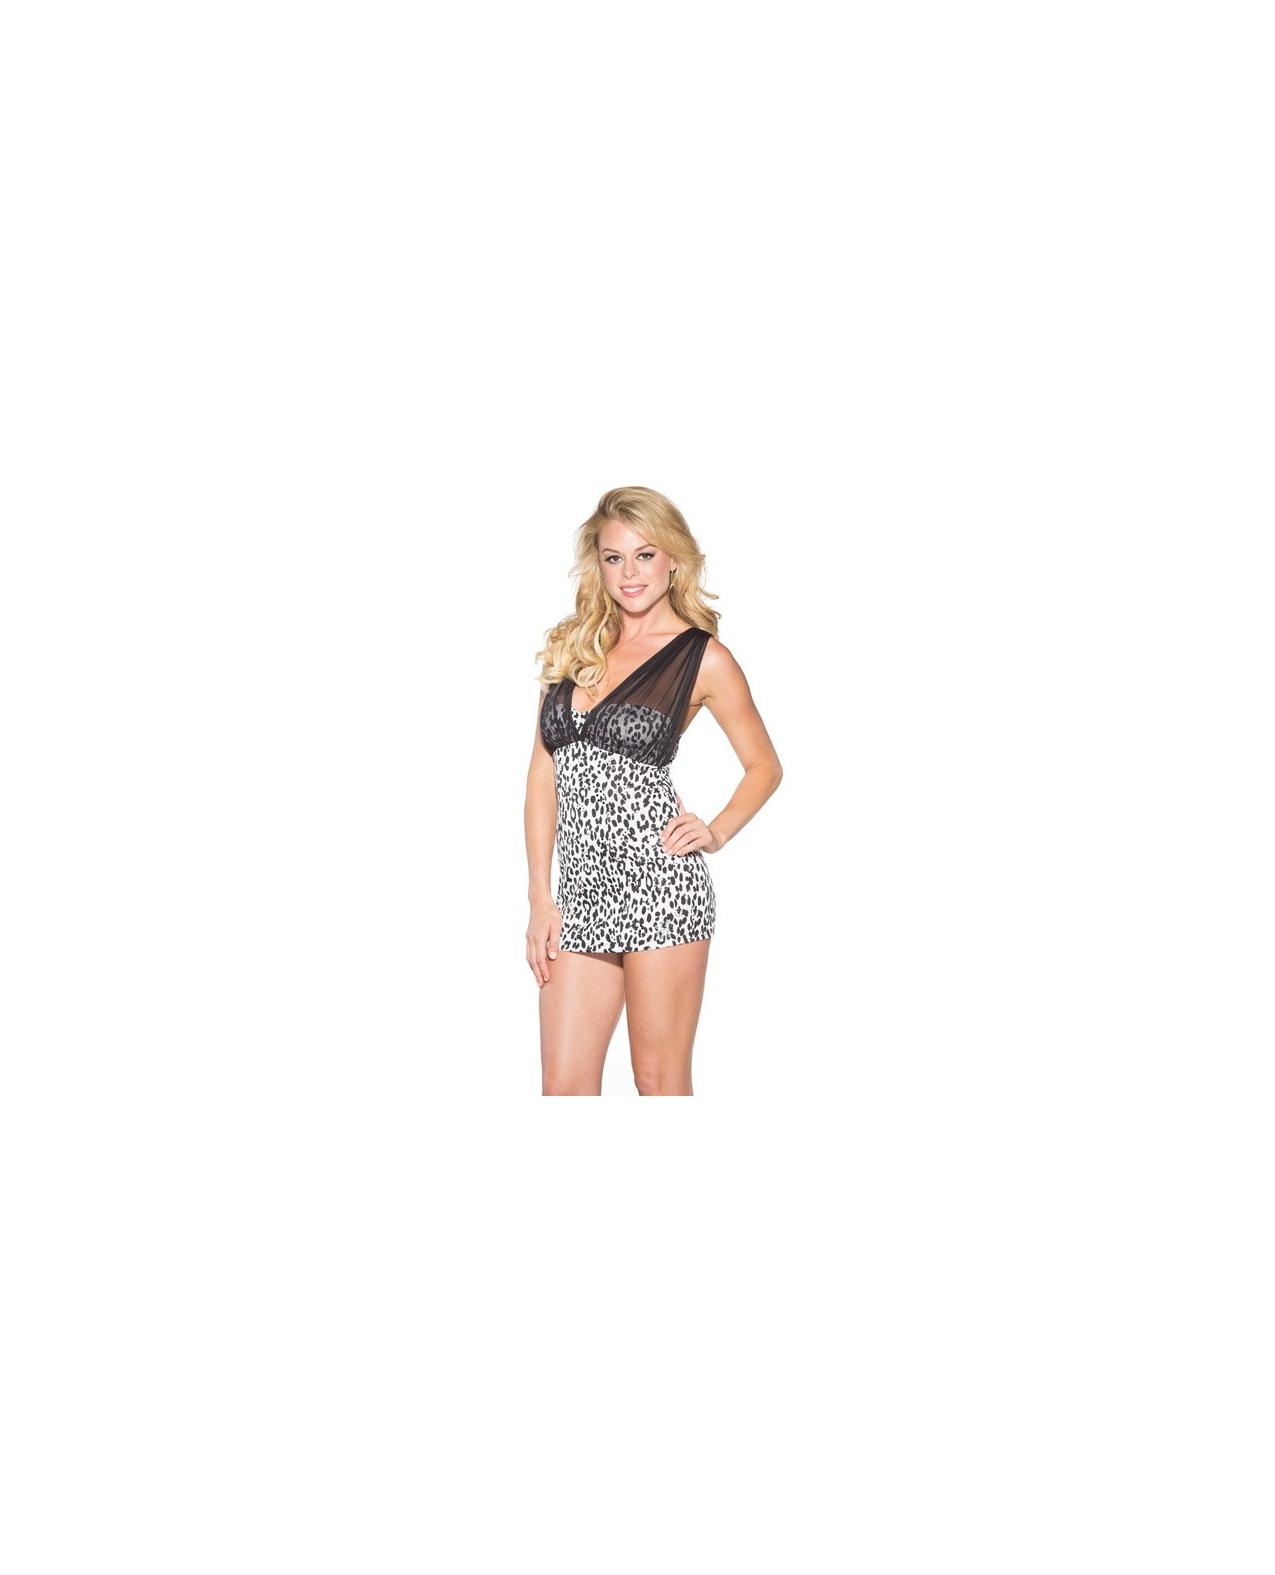 Snow Leopard Dress w/Mesh Adjustable Straps & G-String Black/White 2X